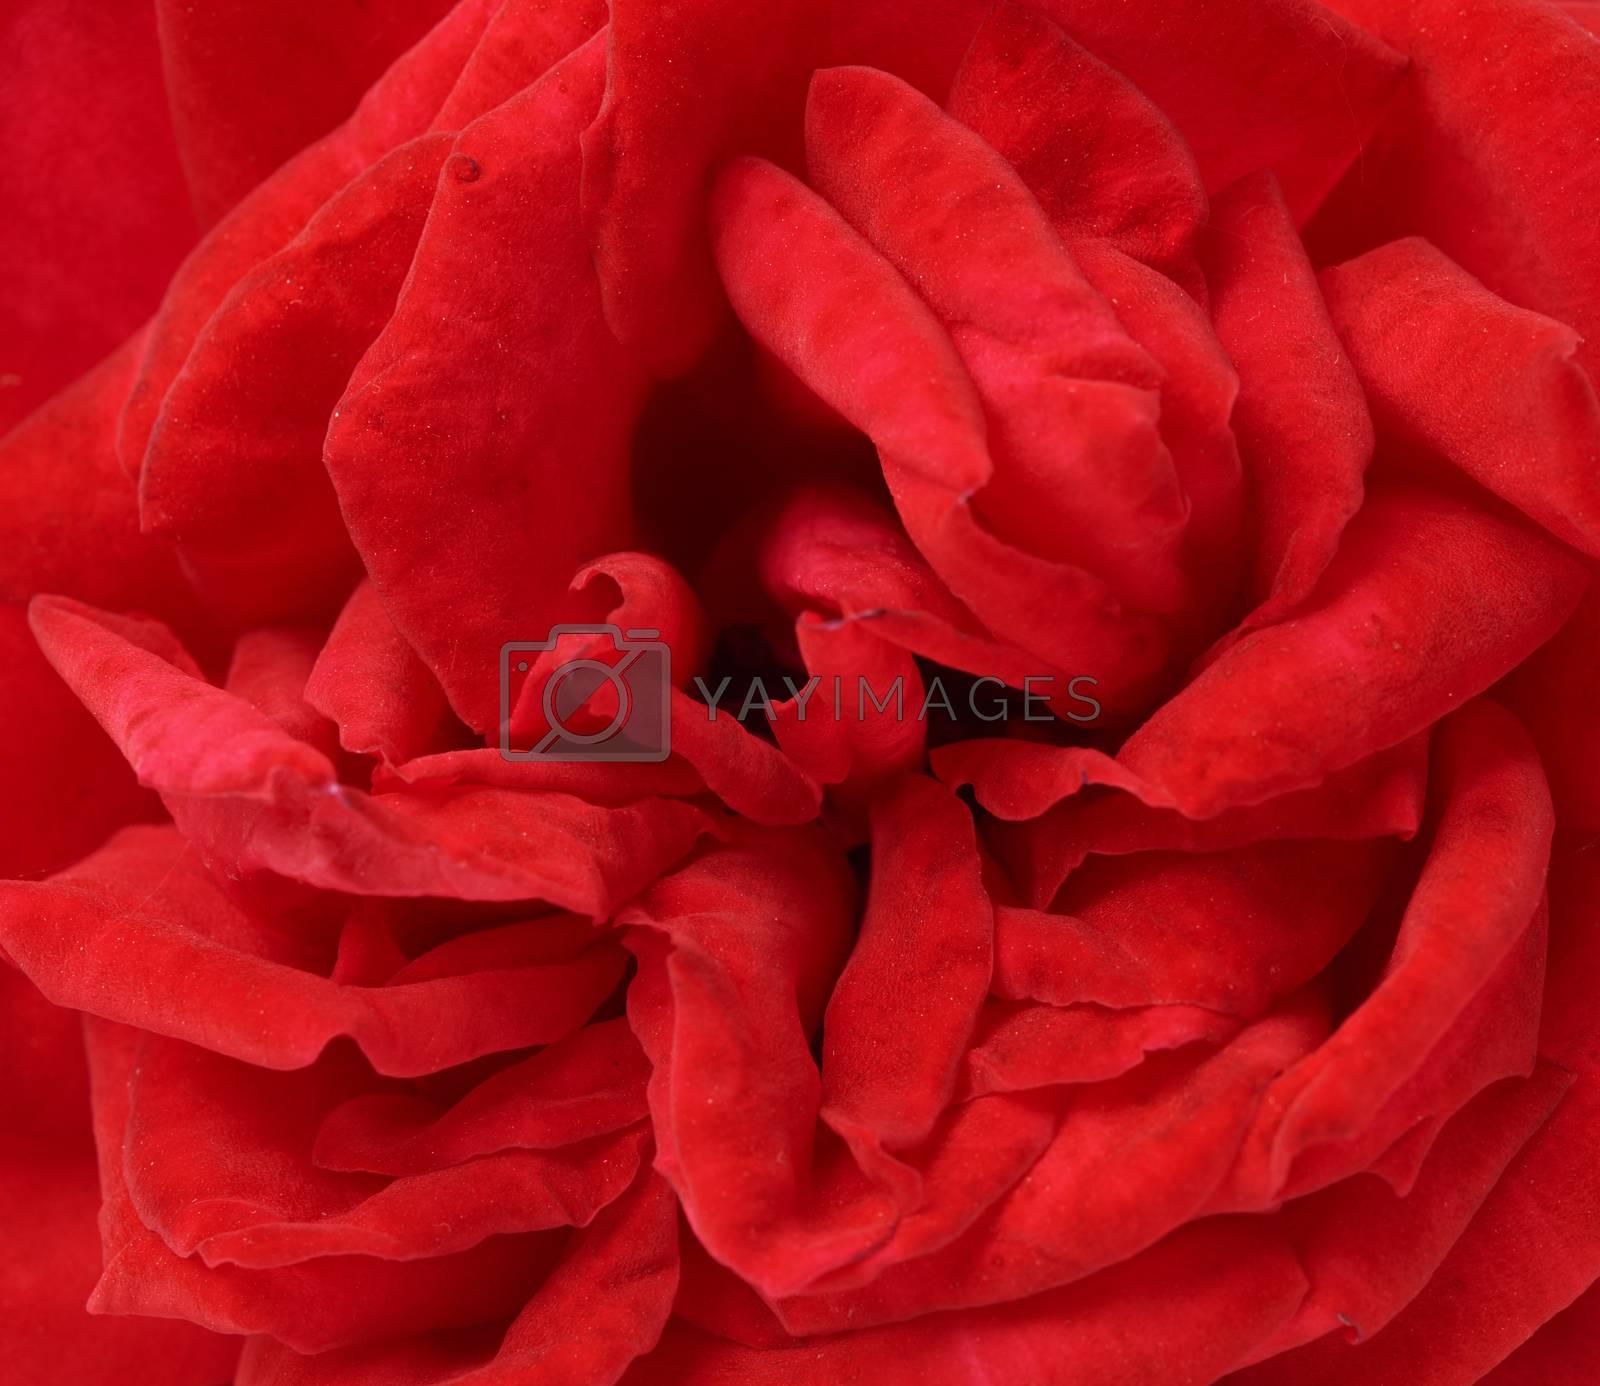 bud of a red blooming rose, full frame, macro